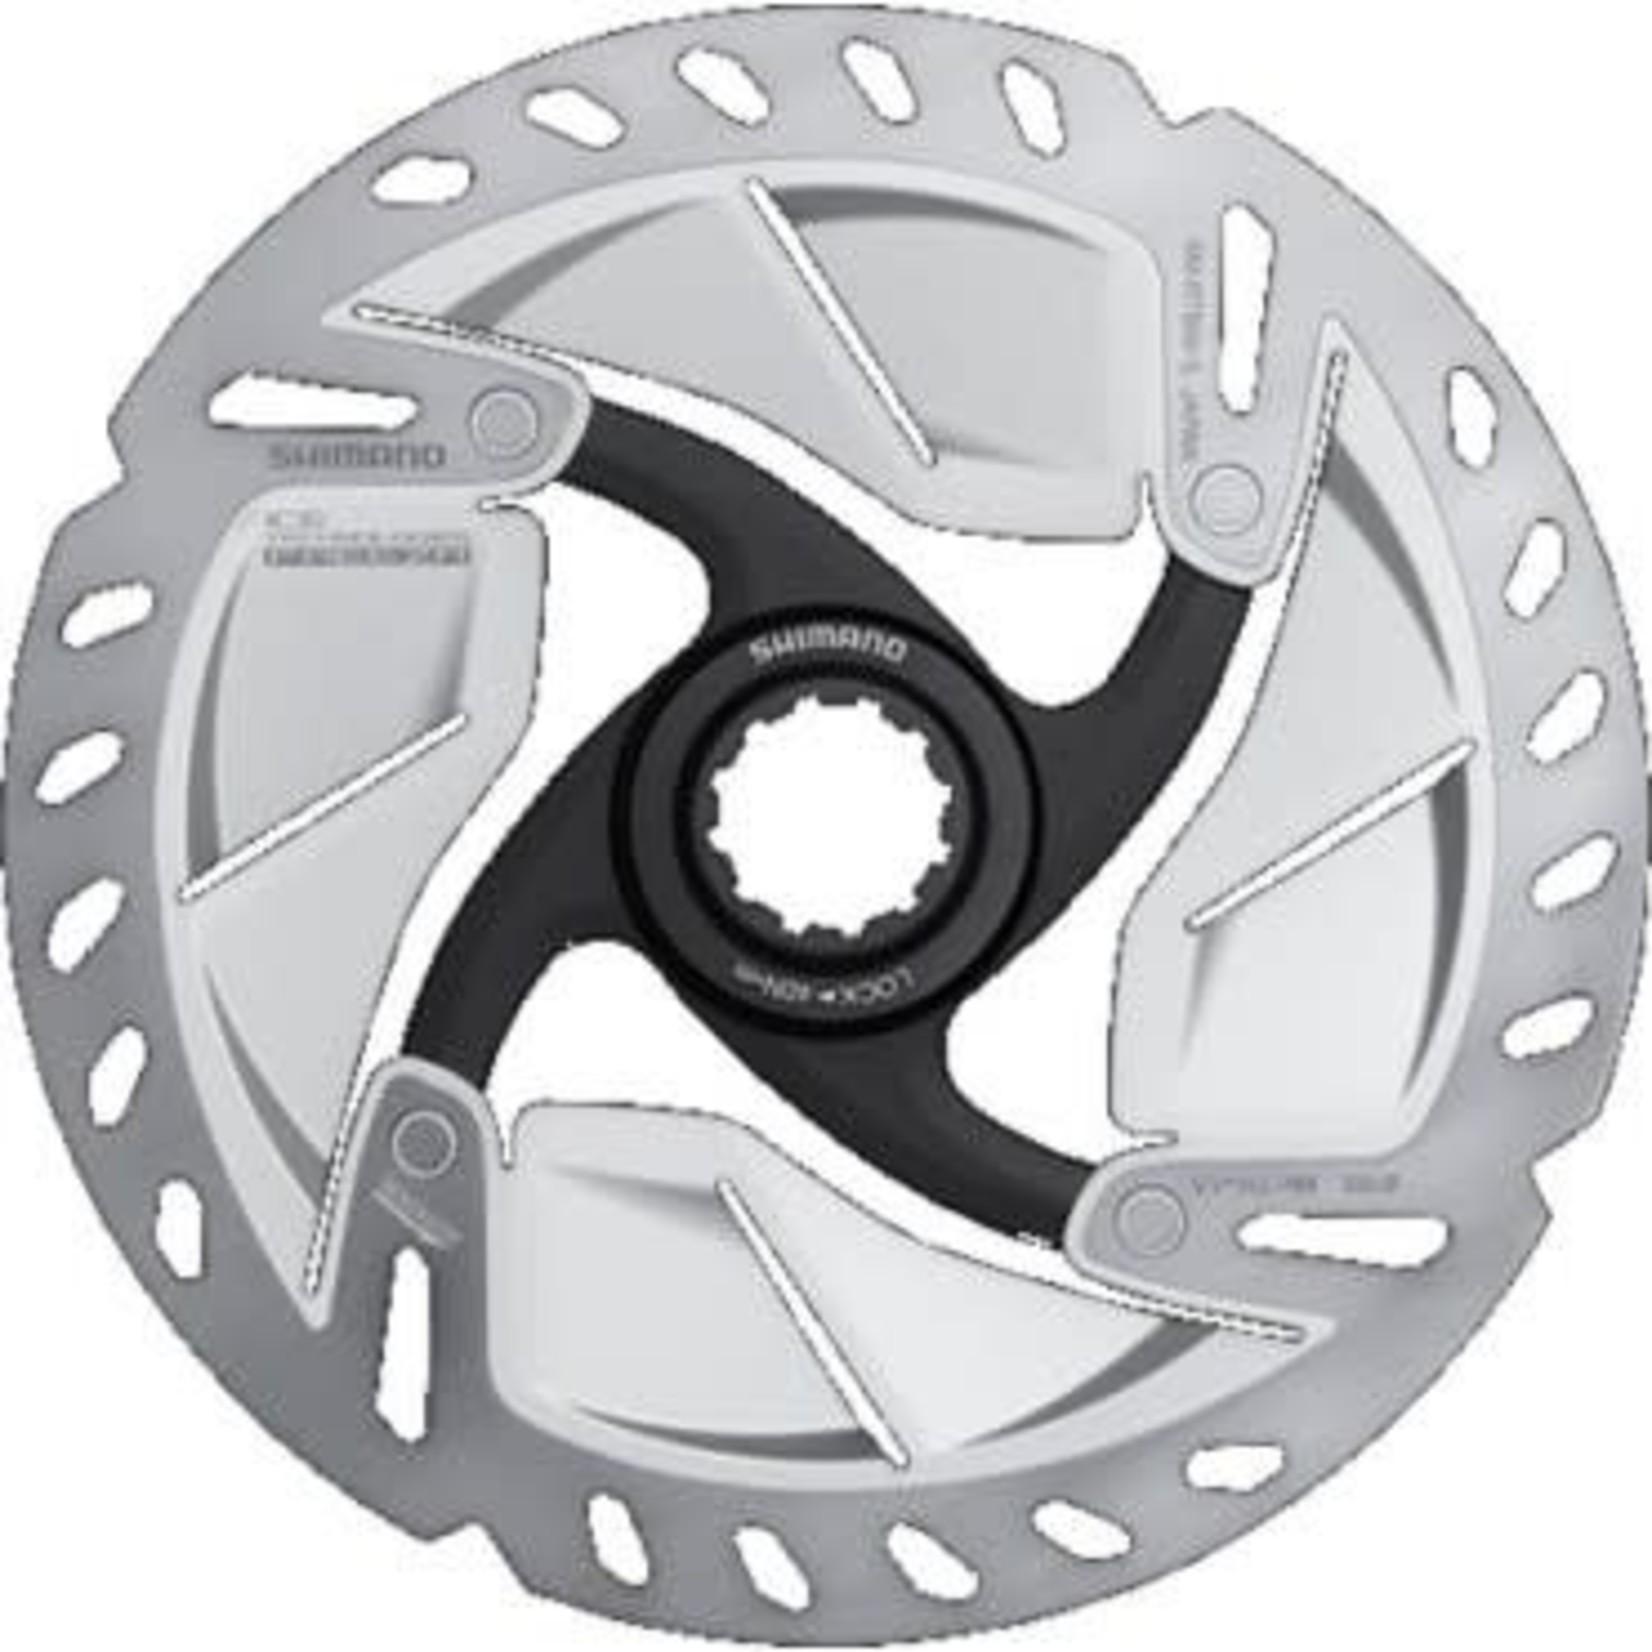 Shimano SM-RT800 Disc Brake Rotor Ultegra 140mm